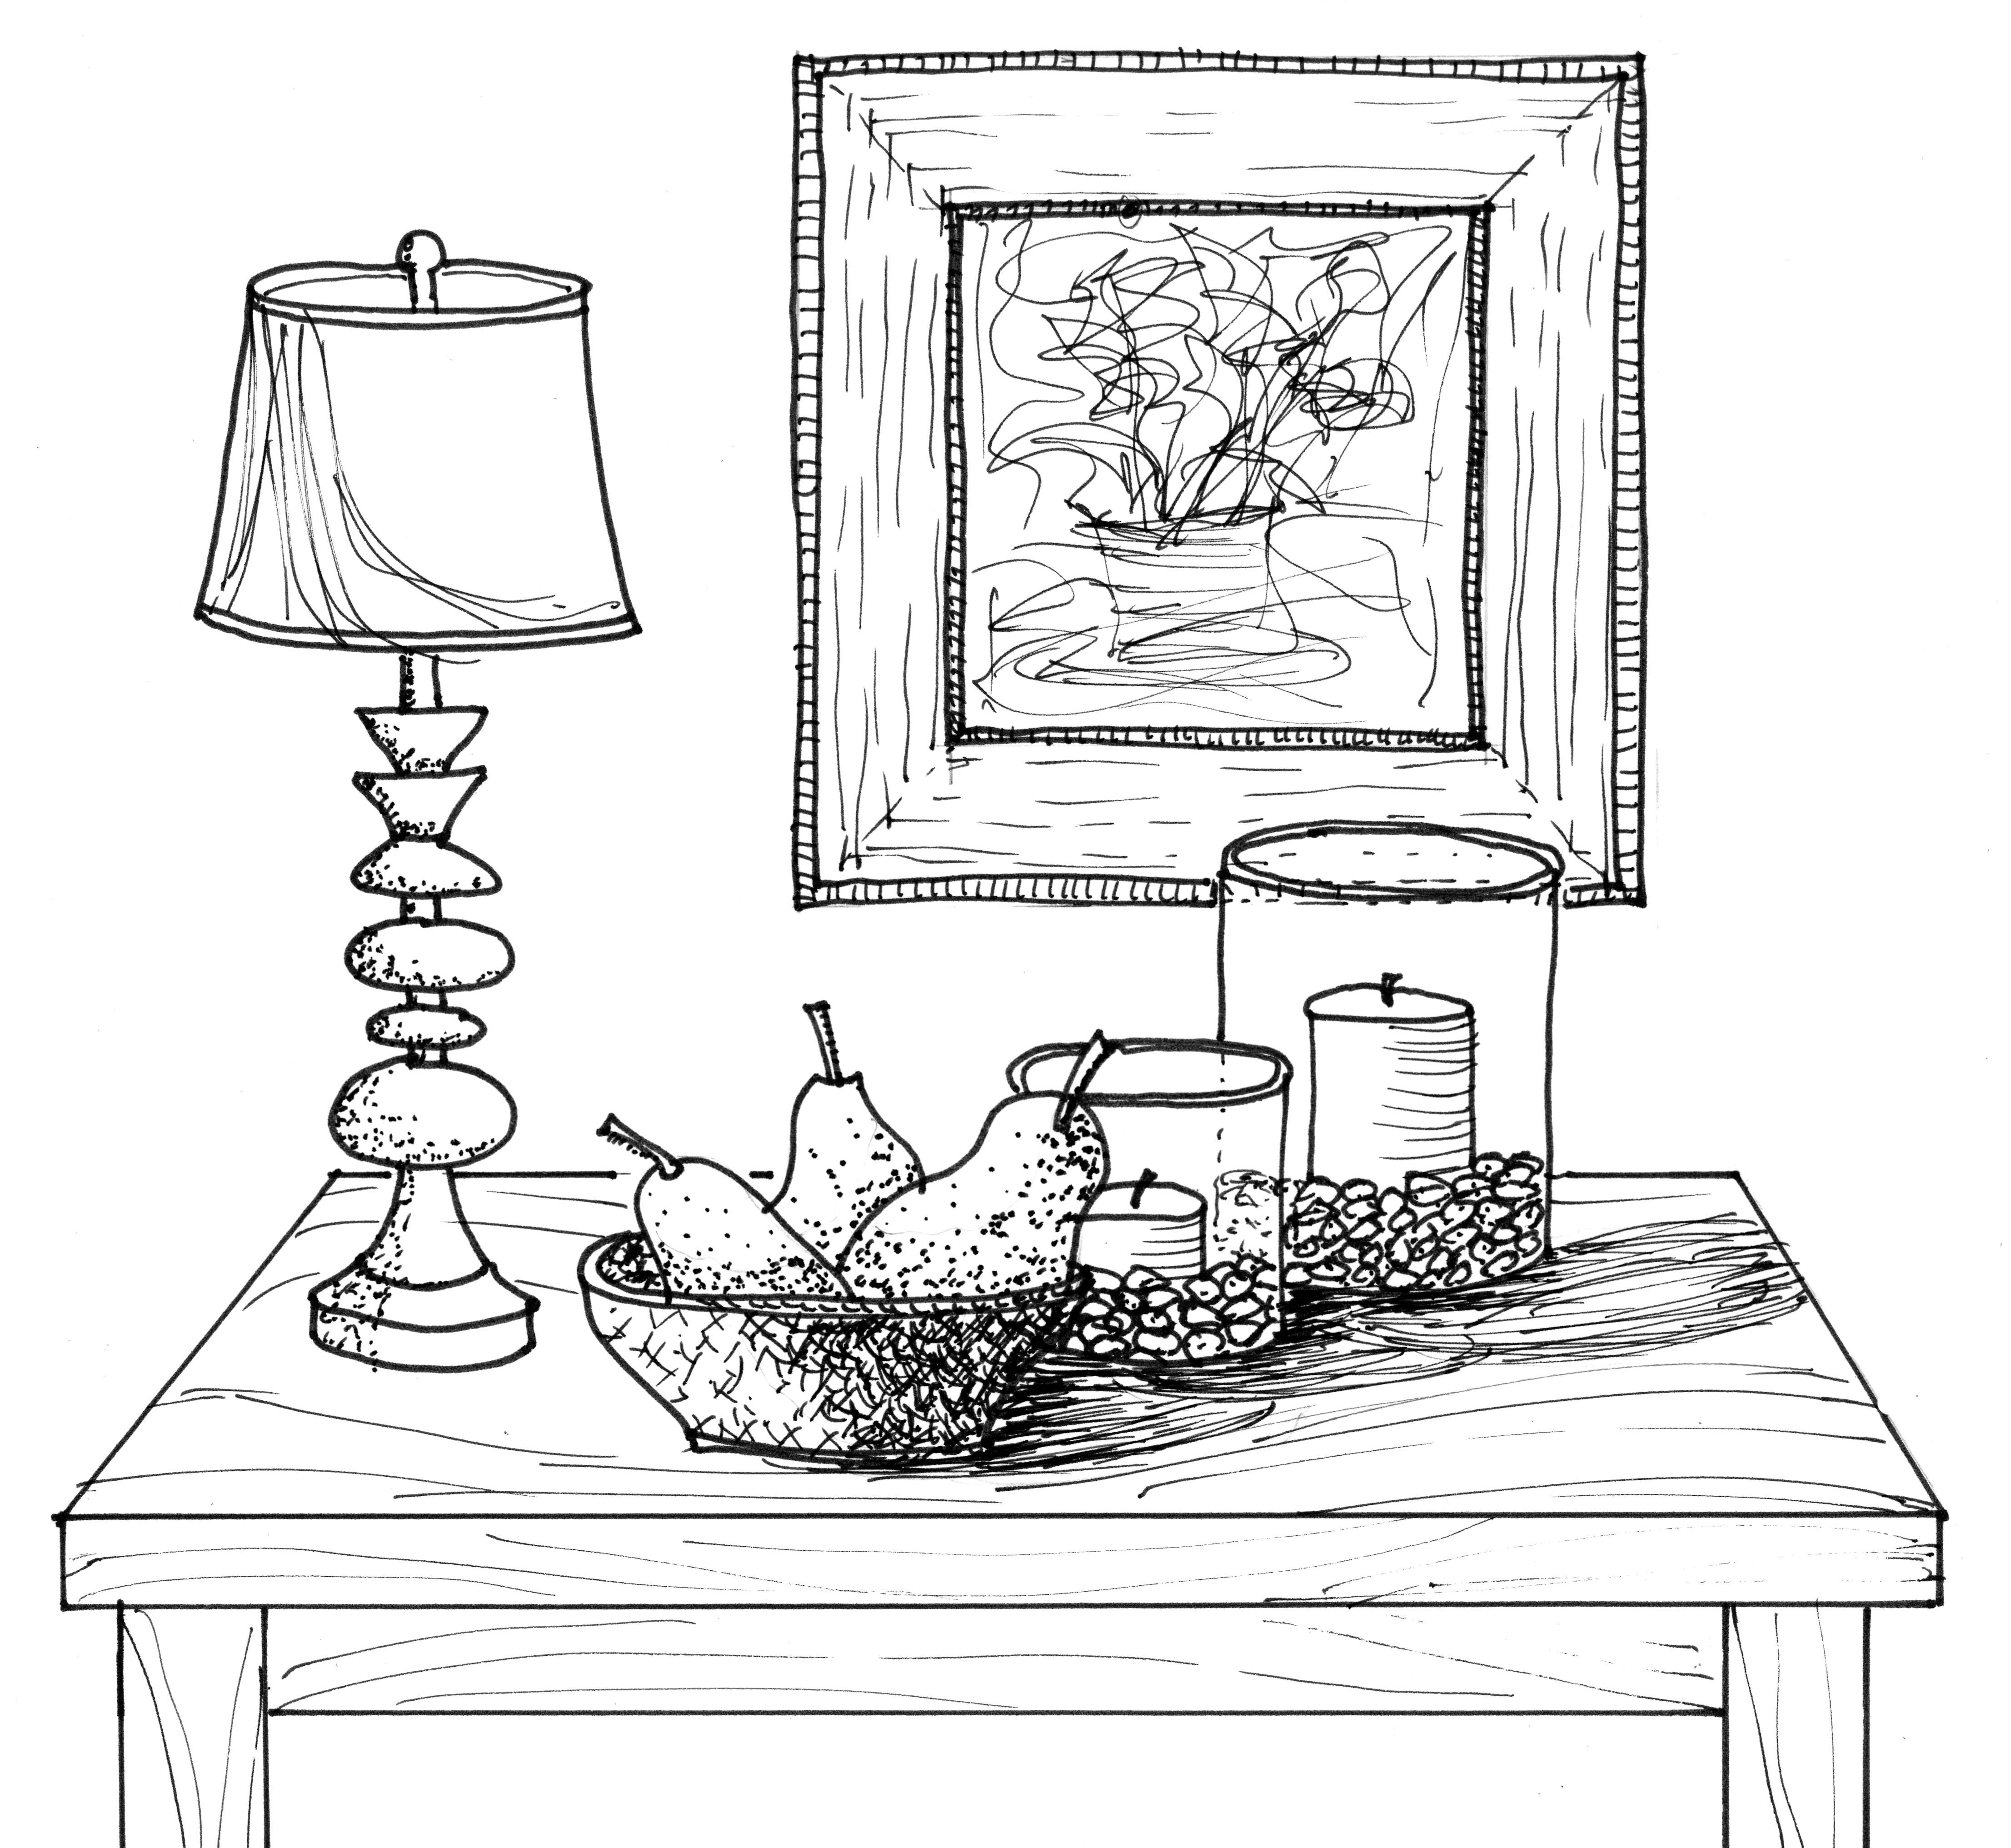 Drawn vase shadow Shadow & Drawing it Put